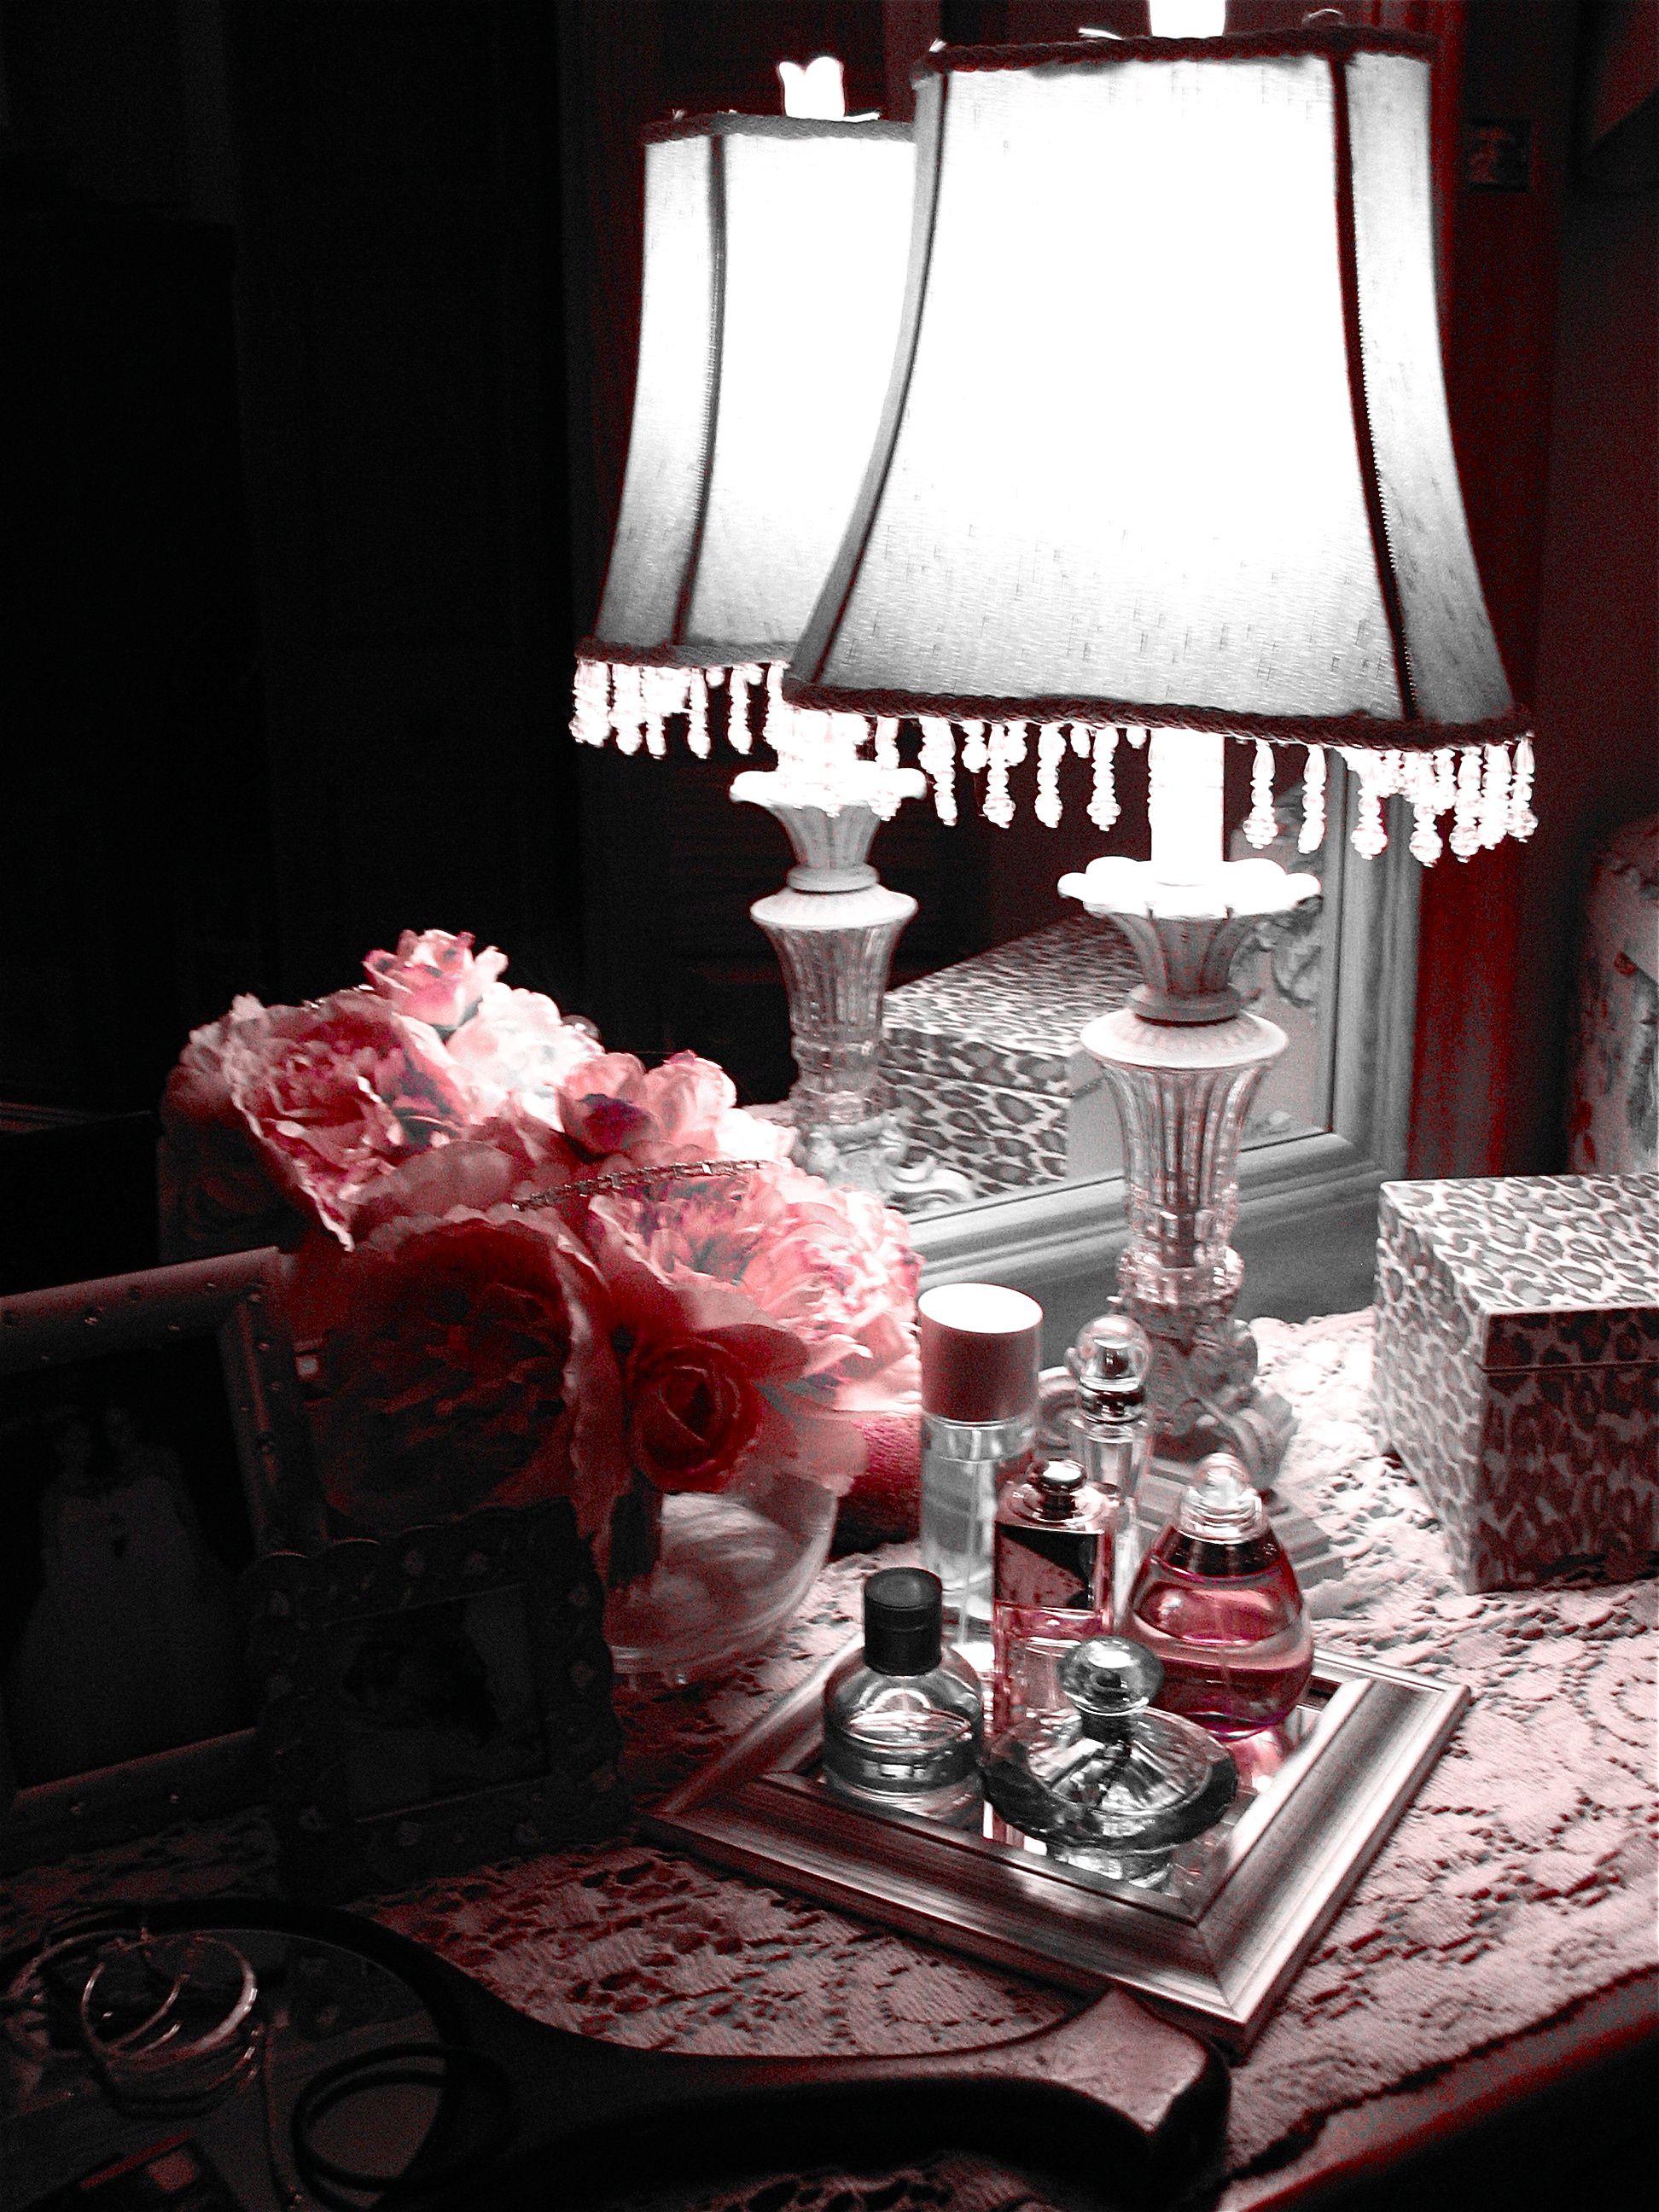 boudoir decorating    perfume bottles on my nightstand  why didn t. boudoir decorating    perfume bottles on my nightstand  why didn t